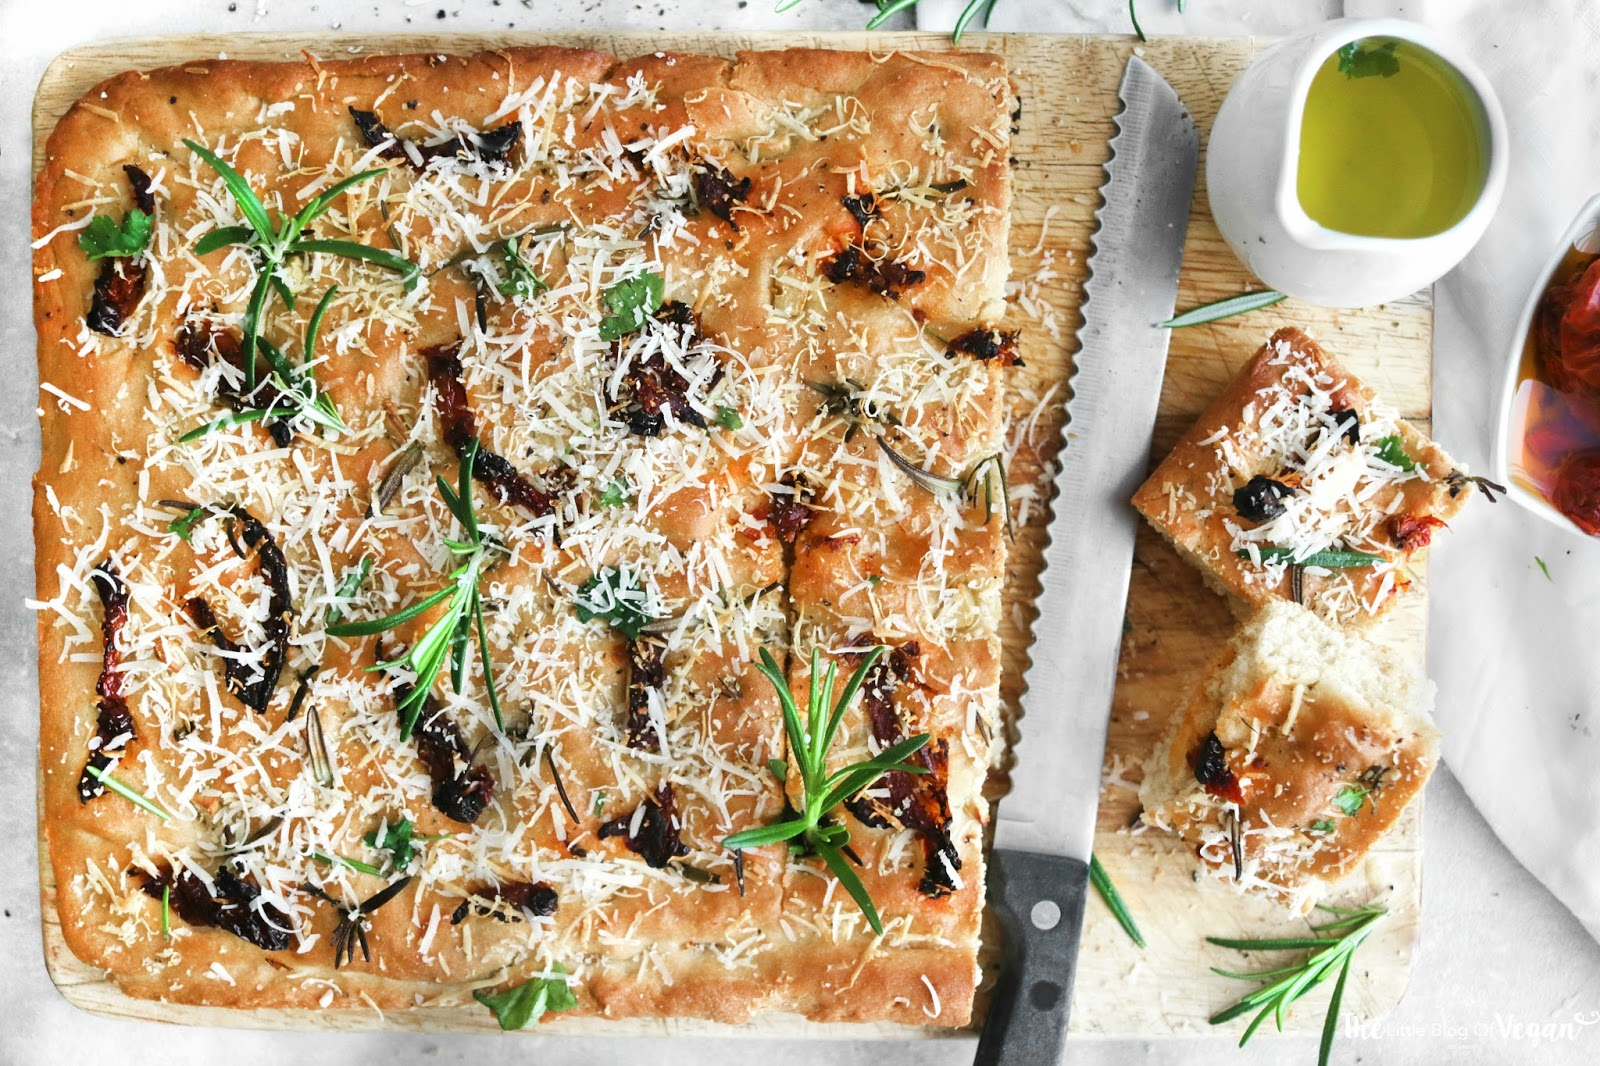 Sundried tomato, garlic & rosemary focaccia recipe | The ...